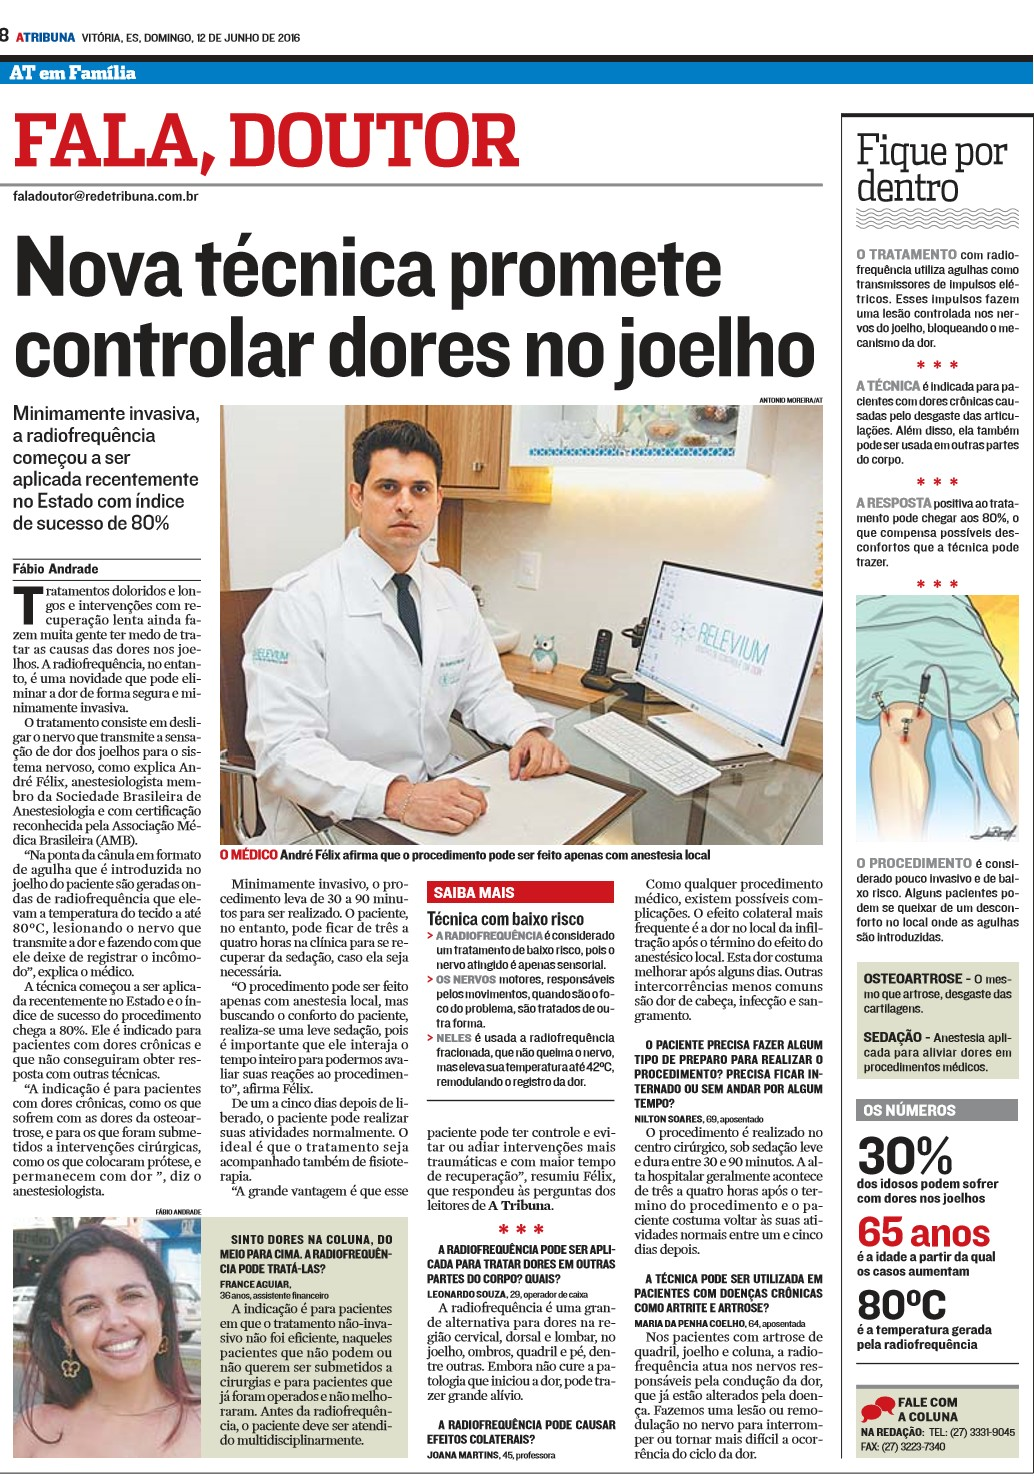 12jun2016-Relevium-Jornal-A-tribuna-AT2-em-Familia-Coluna-Fala-Doutor